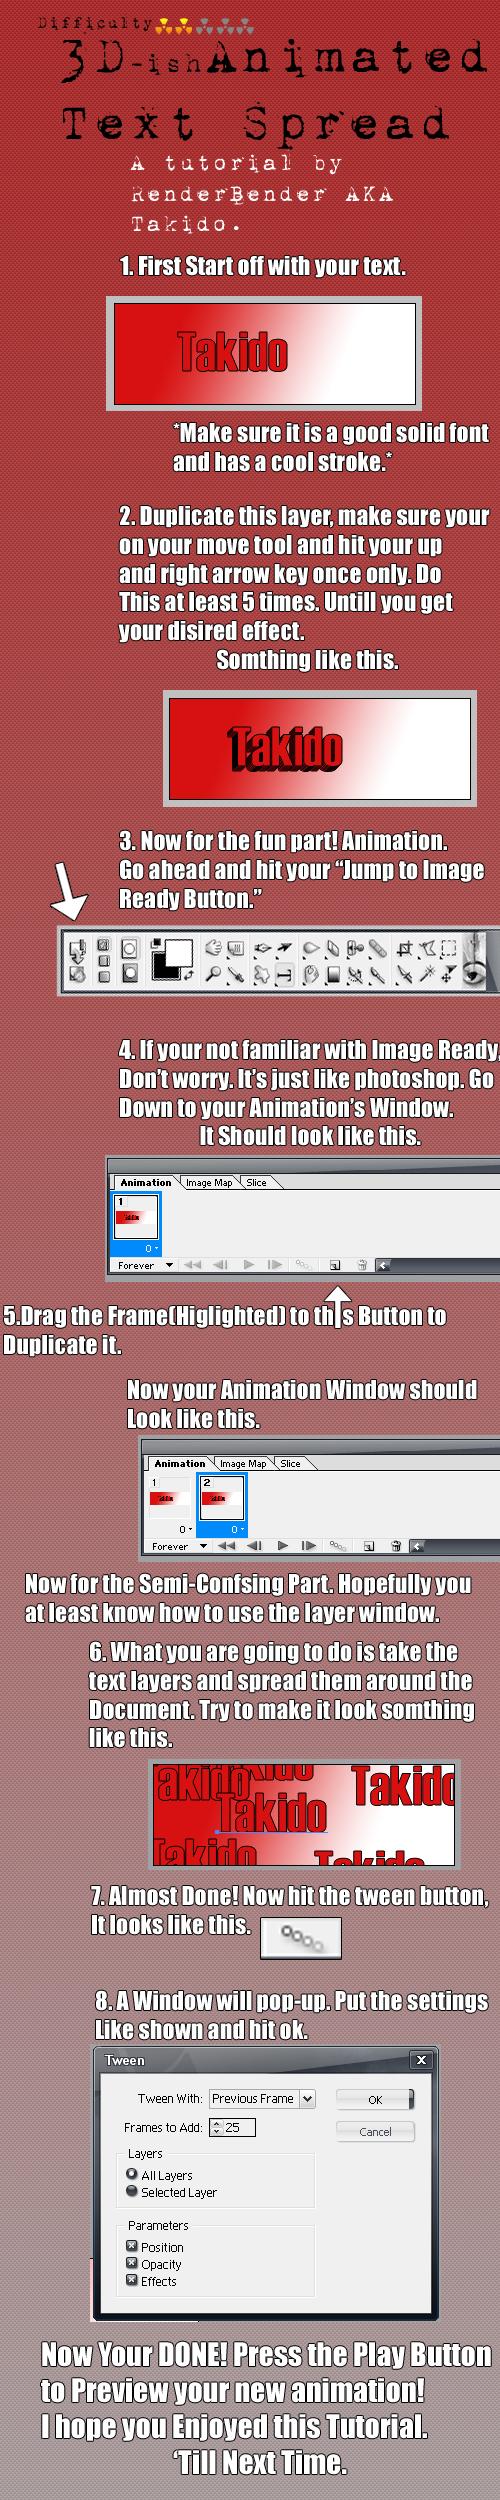 3D Animated Text Spread